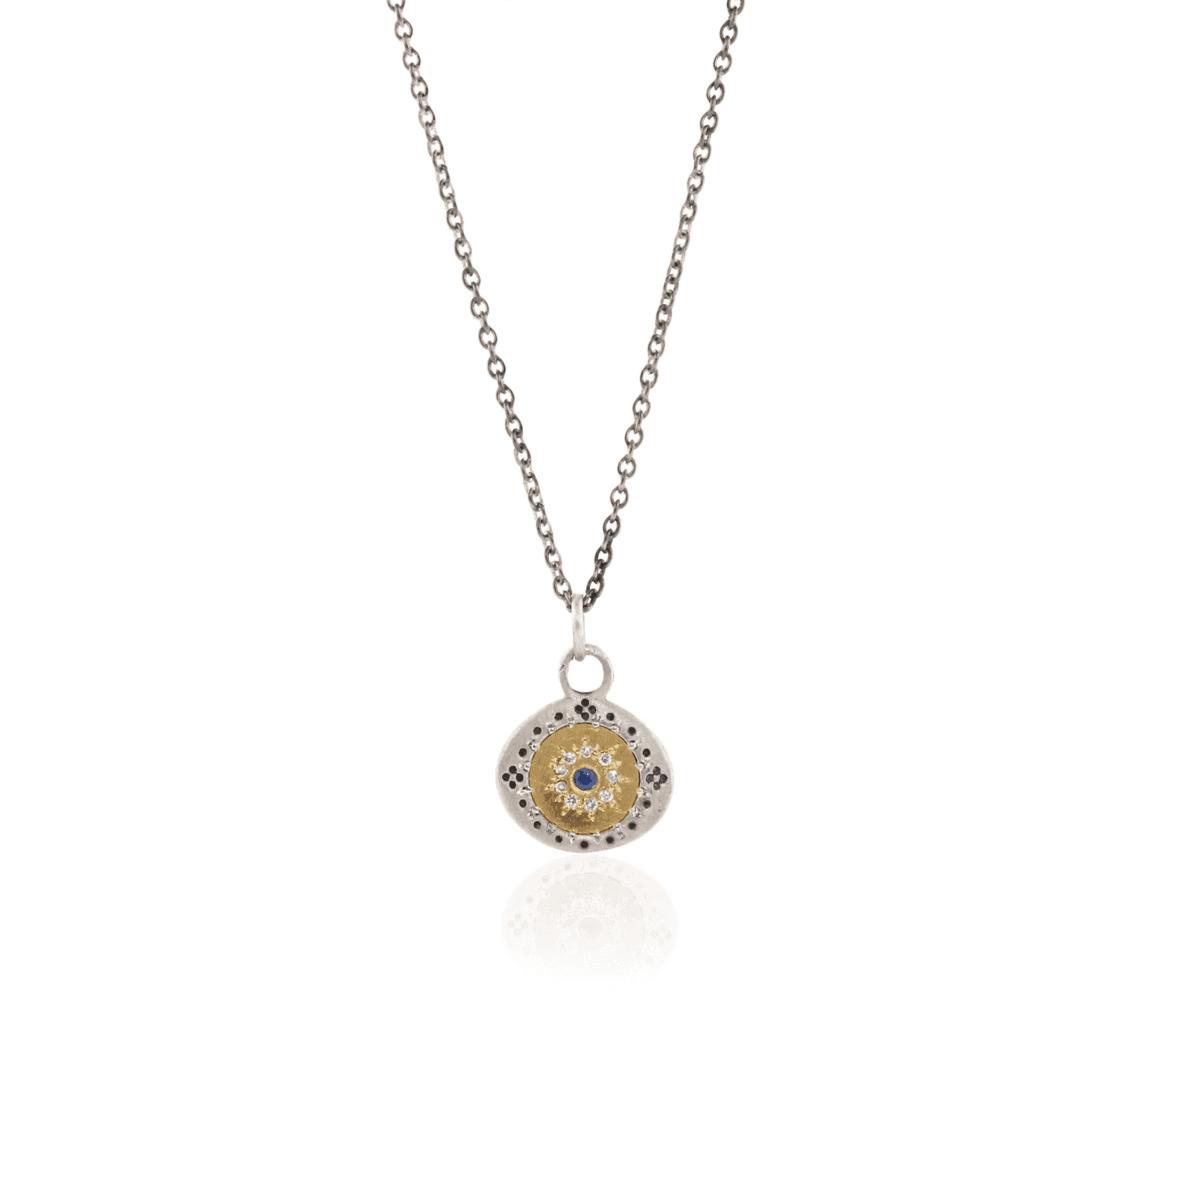 Diamond and Sapphire Neckalce - Adel Chefridi - Mansoor Jewelers